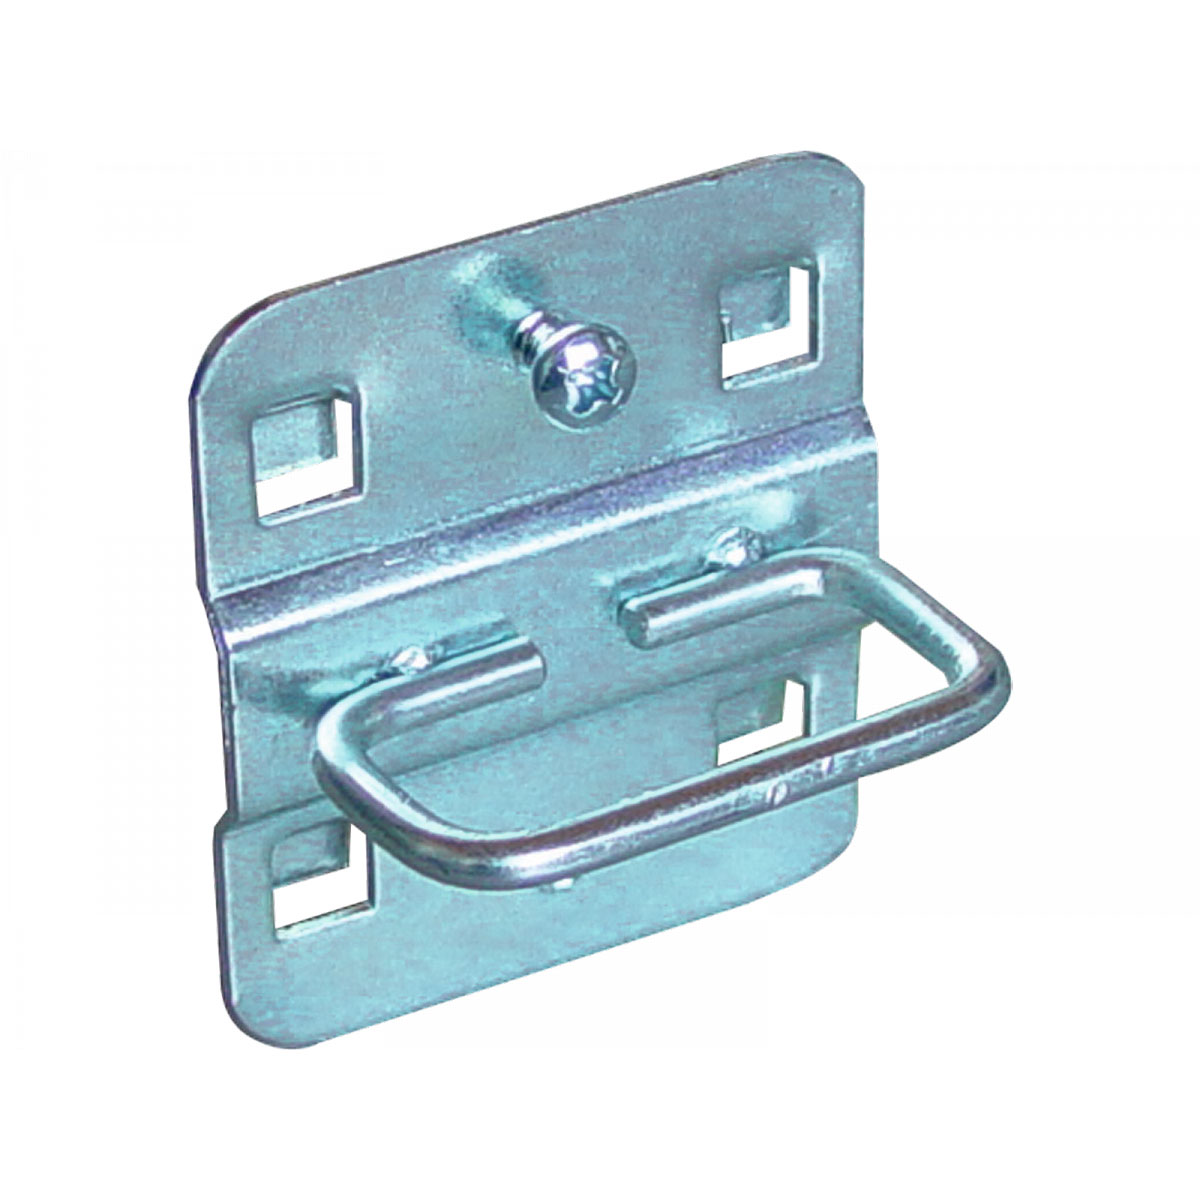 Güde Zangenhalter, oval 50/25 mm